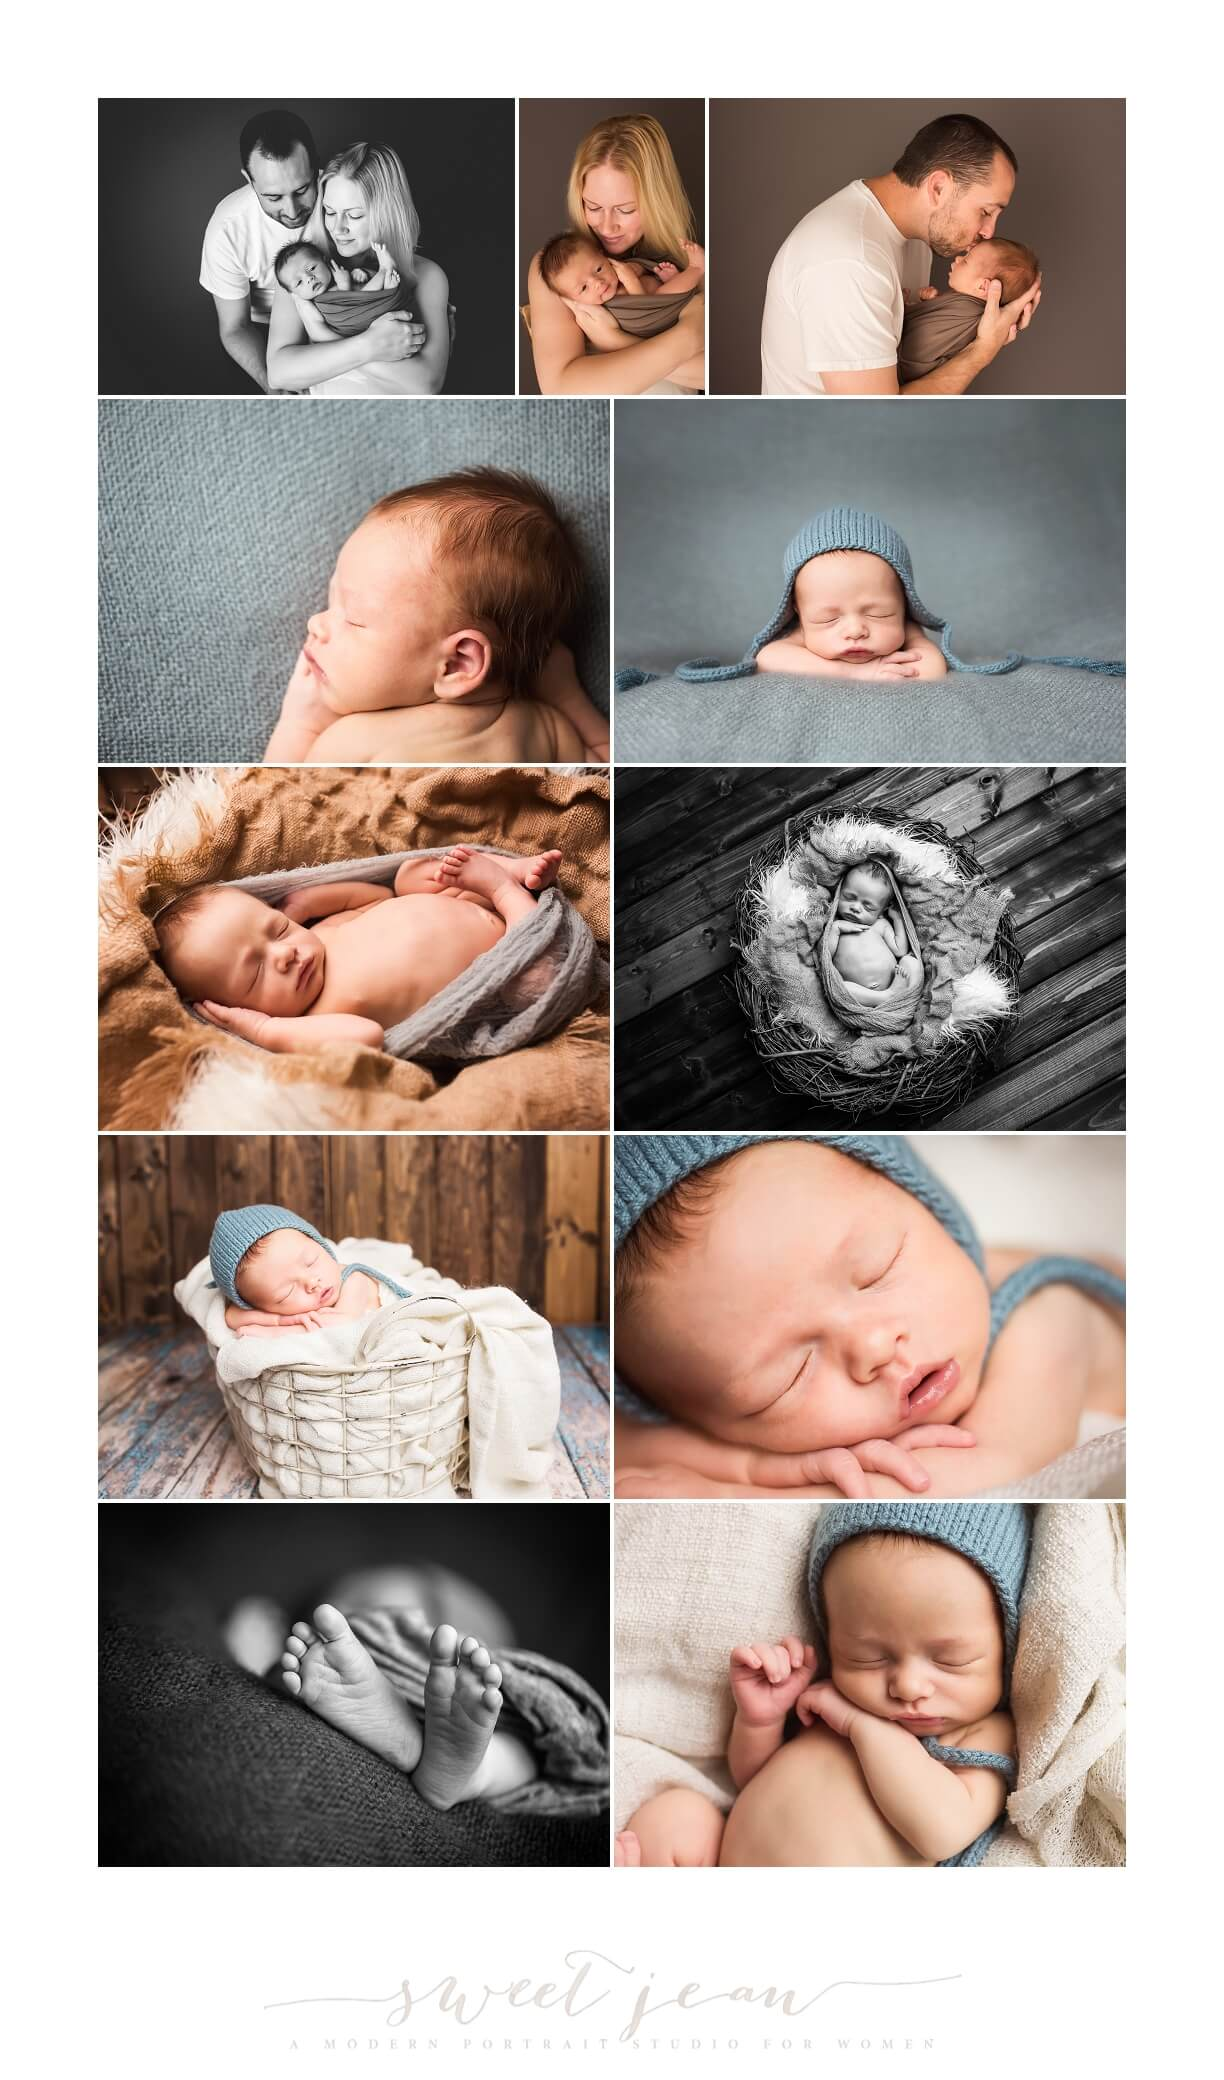 Kellen | Portrait of a Newborn